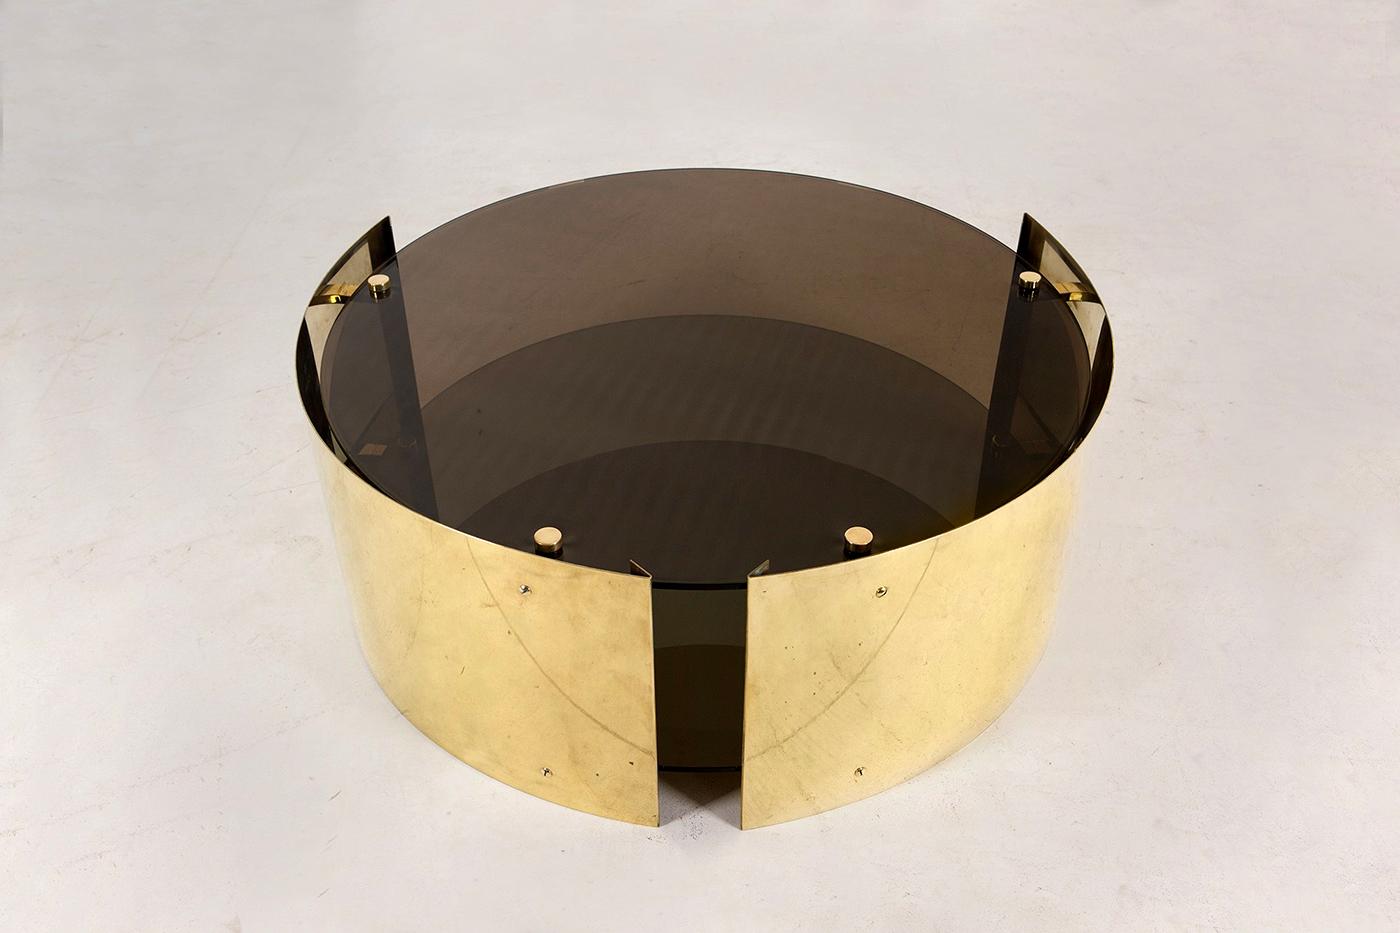 Bevilacqua Architects – Caio Brass Coffee Table